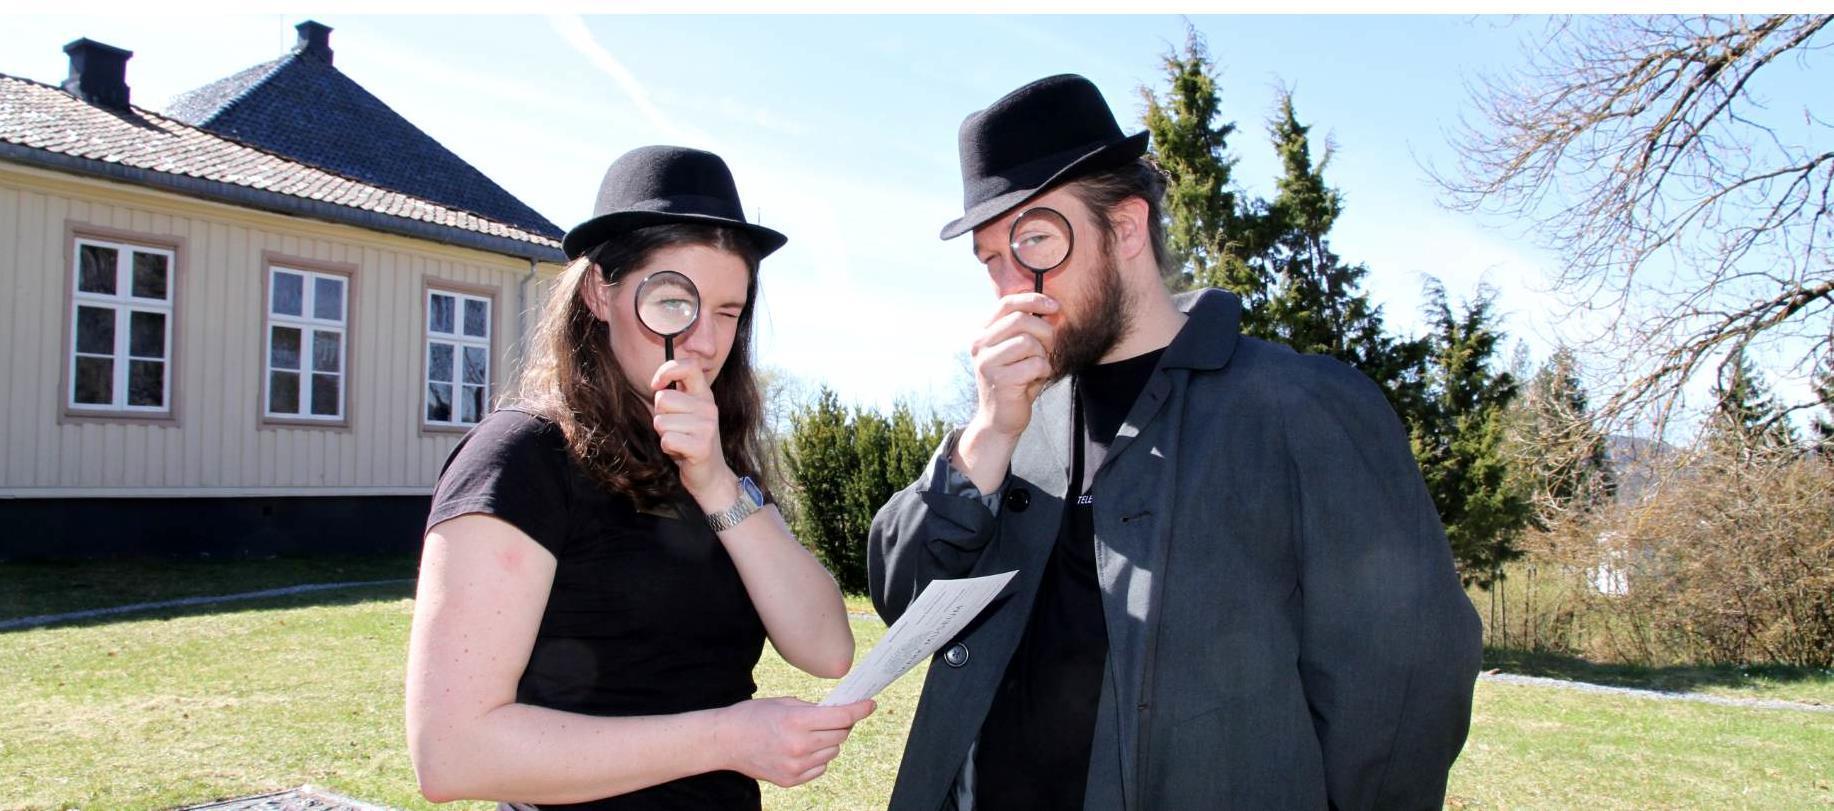 Parkdetektiv i Brekkeparken